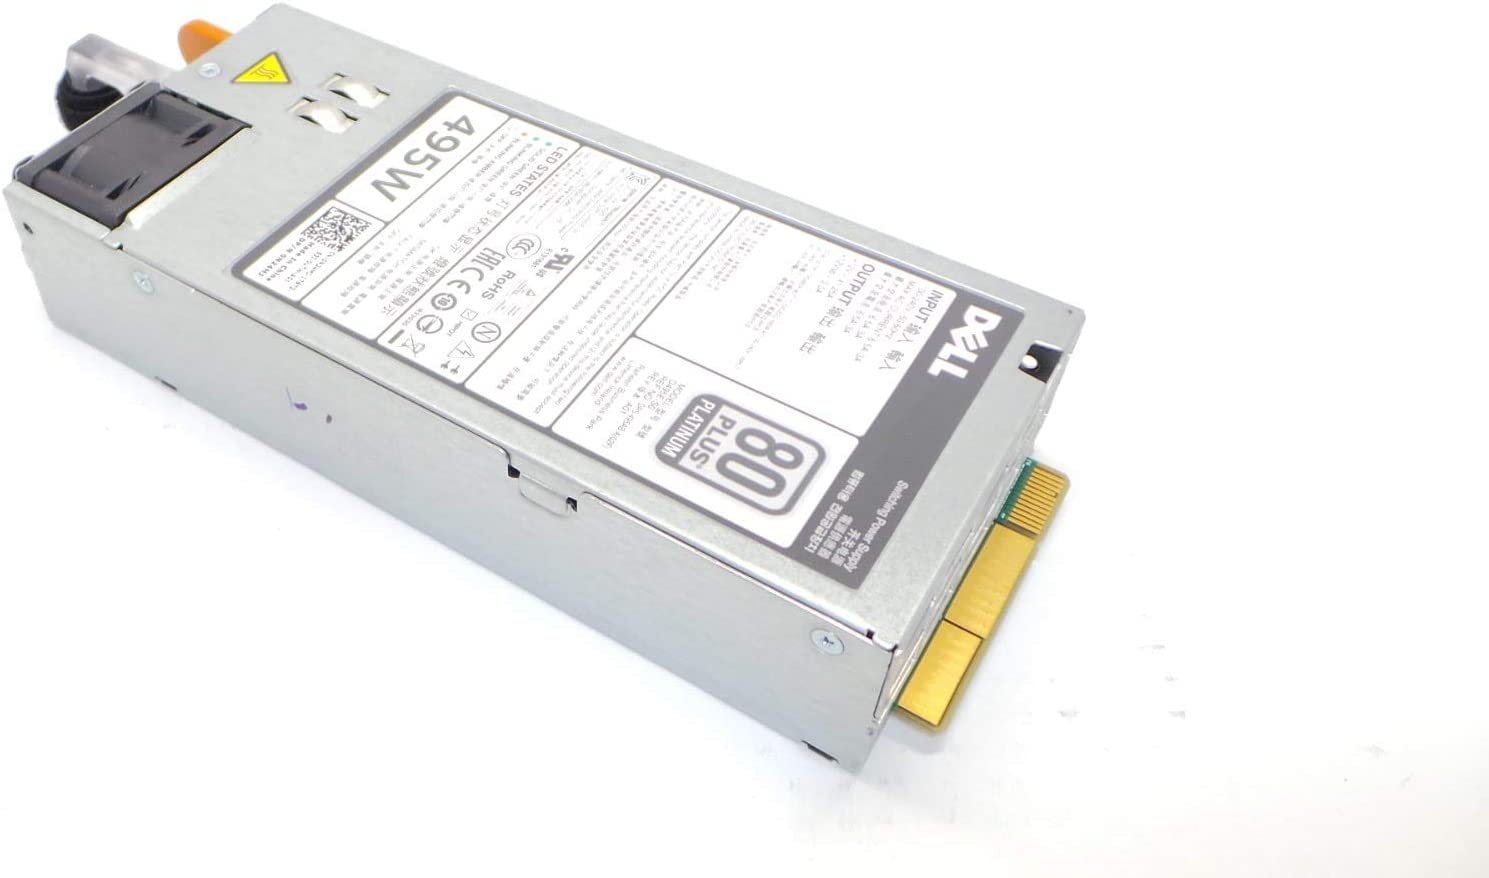 495W 80 Plus Platinum REDUNDANT Power Supply FITS Dell PowerEdge T320 T420 T620 R620 R720 R720XD D495E-S0 N24MJ 3GHW3 T420 D495E-S0 13MD5 0N24MJ 03GHW3 013MD5